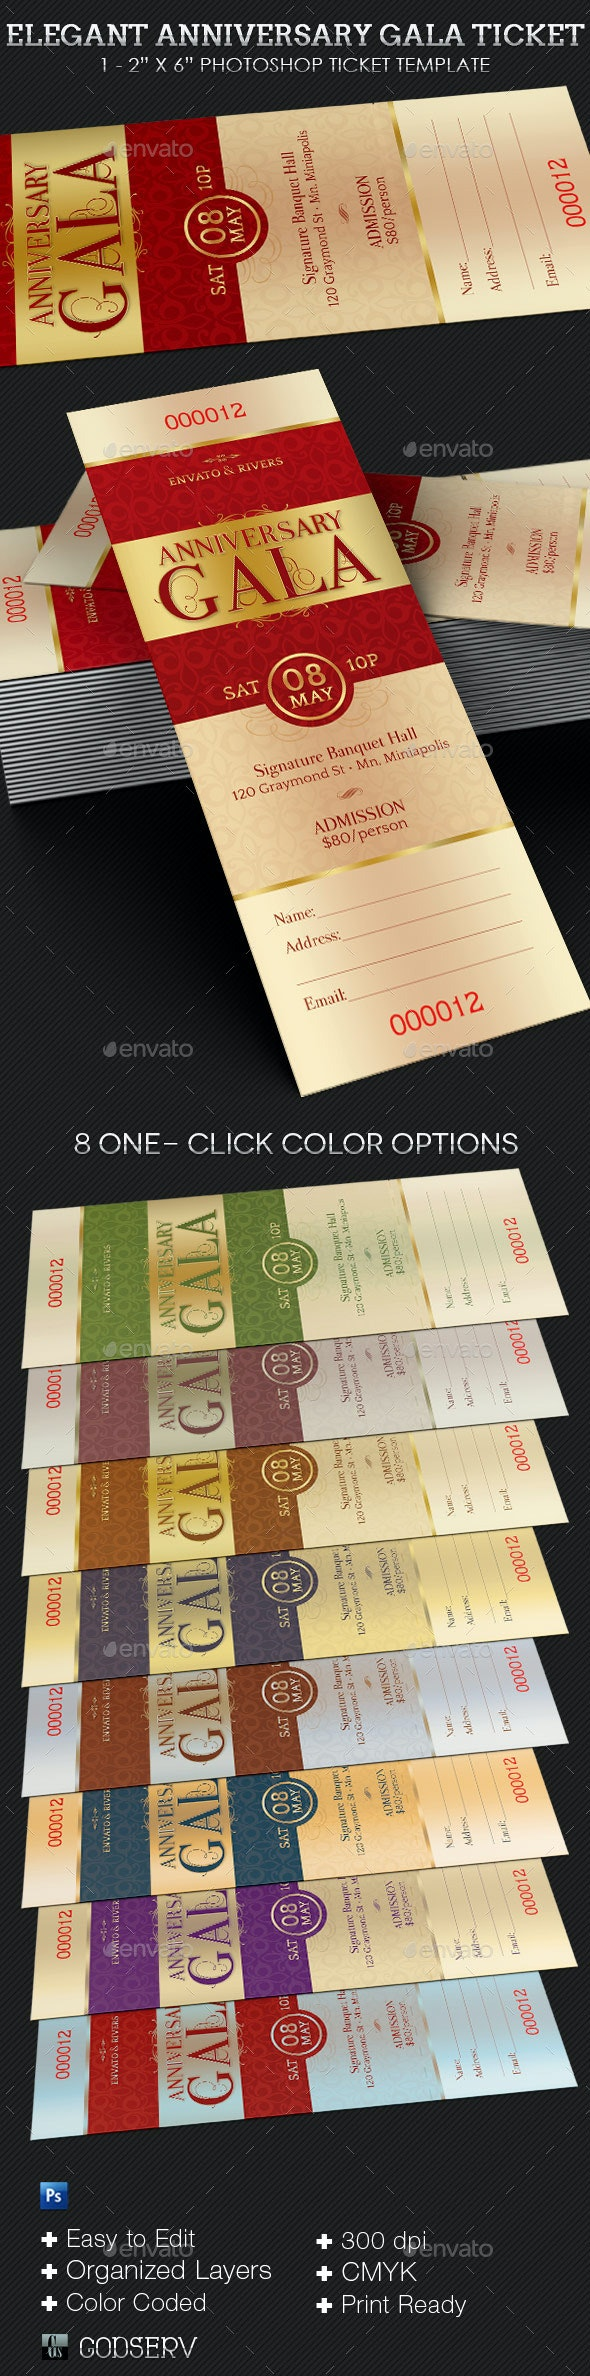 Elegant Anniversary Gala Ticket Template - Miscellaneous Print Templates